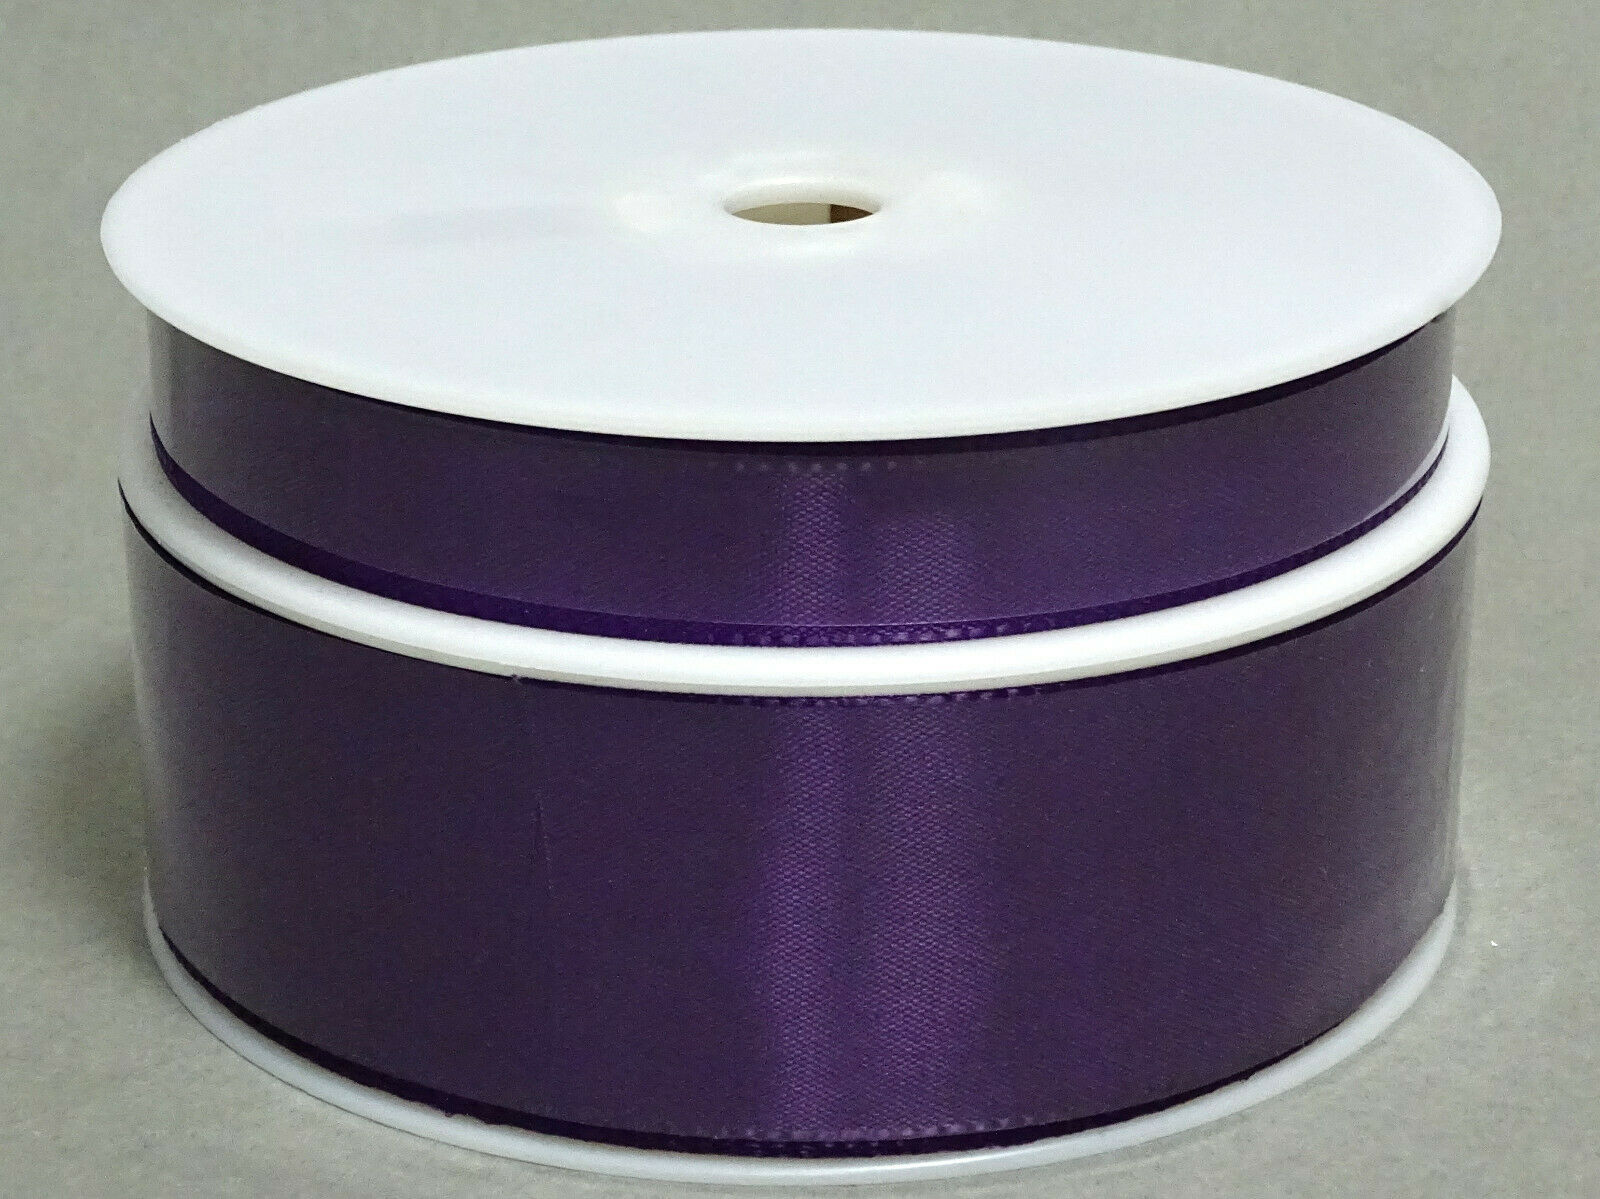 Seidenband Schleifenband 50 m x 15 / 25 / 40mm Dekoband ab 0,08€/m Geschenkband  - Violett 133, 15 mm x 50 m